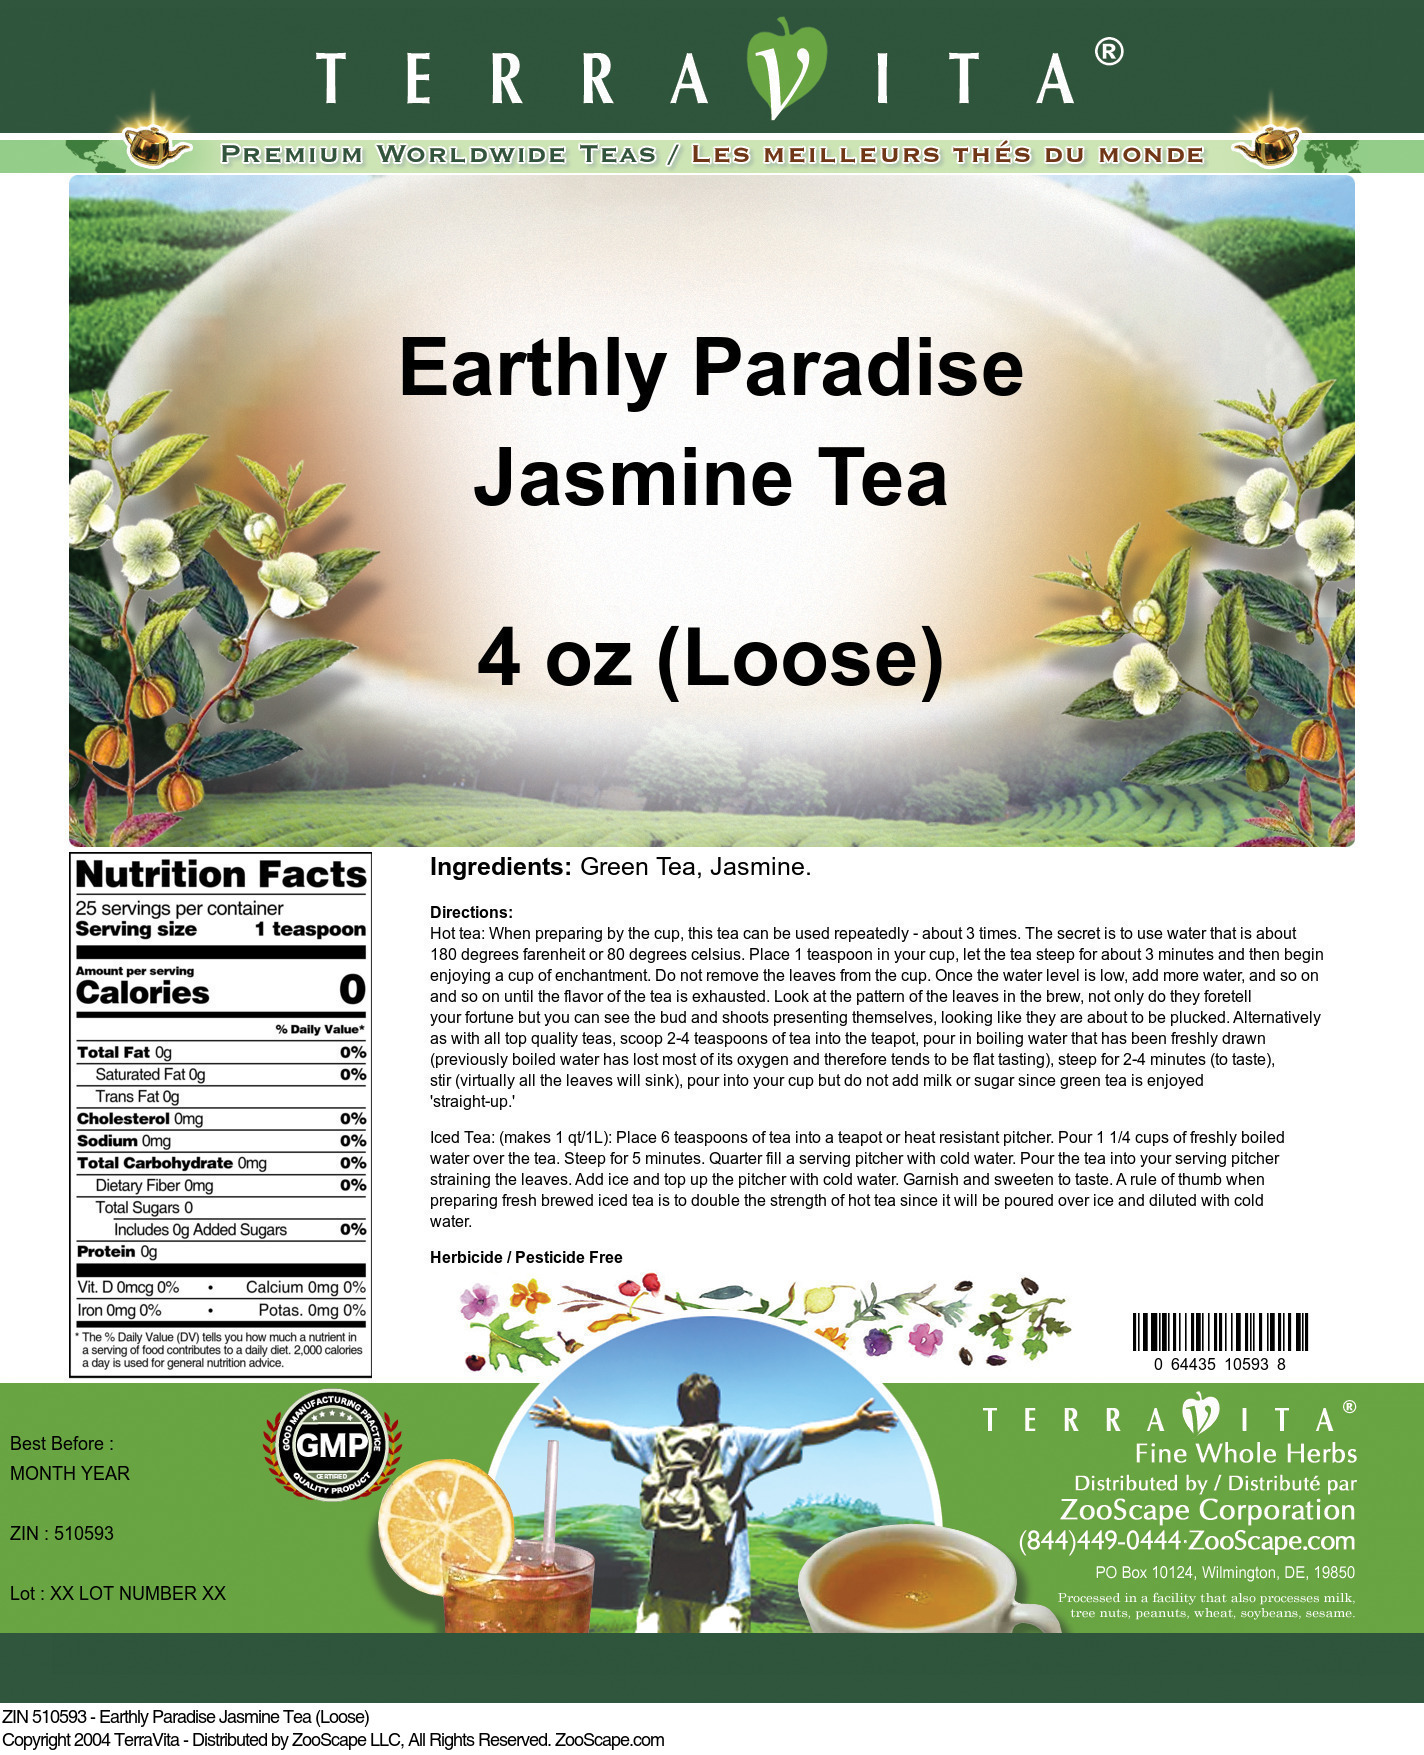 Earthly Paradise Jasmine